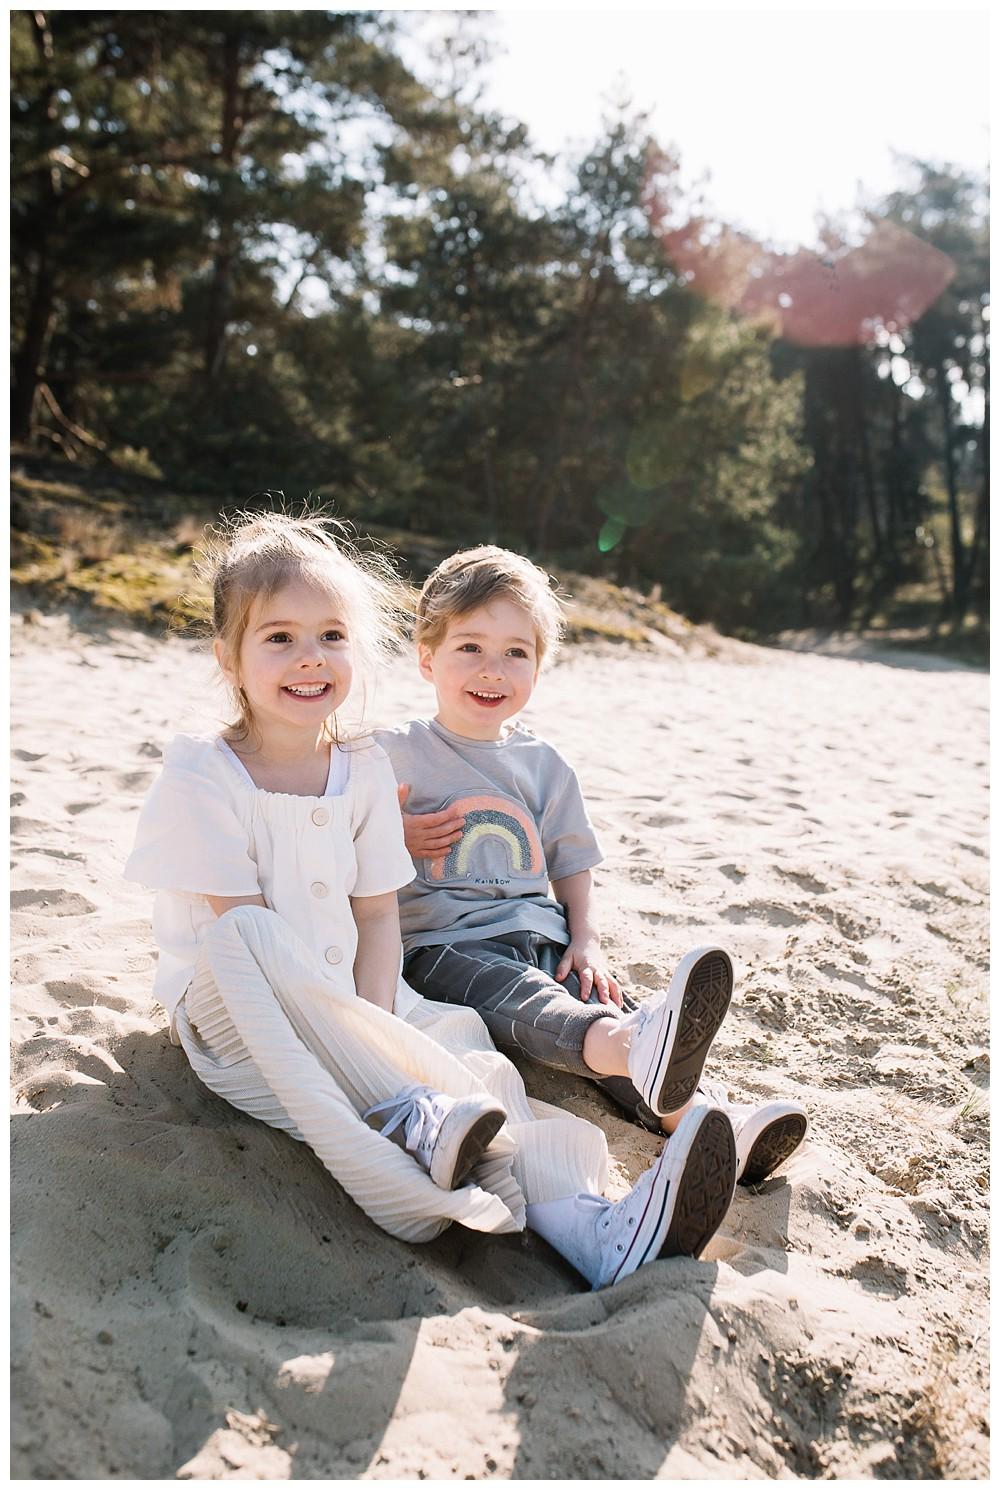 ohbelle_website_blog_gezinsshoot_Lifestyle_buiten_0272-kopie Lifestyle gezinsshoot Wekeromse Zand